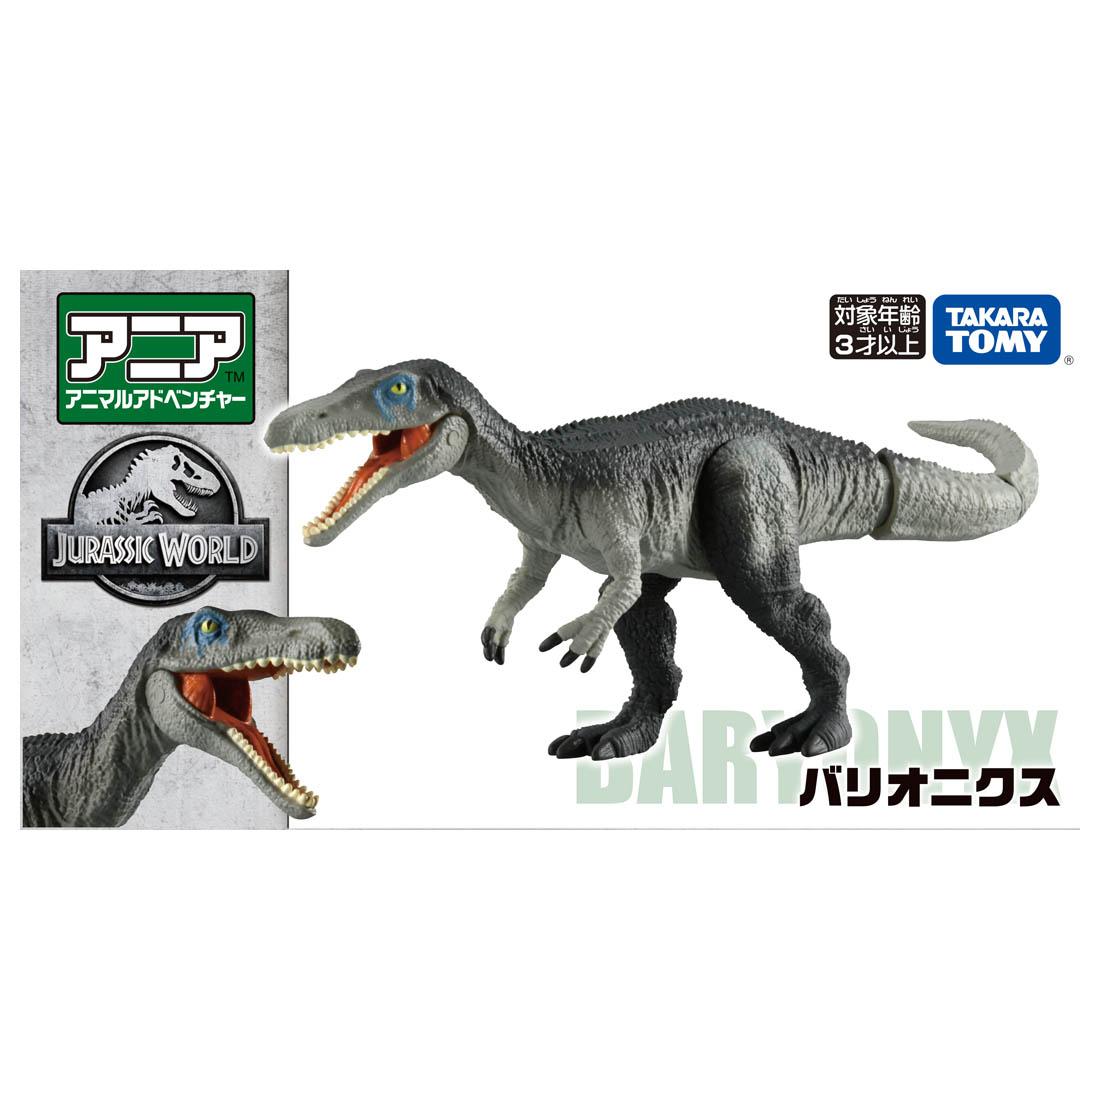 TOMY 動物模型 侏儸紀世界 - 重爪龍